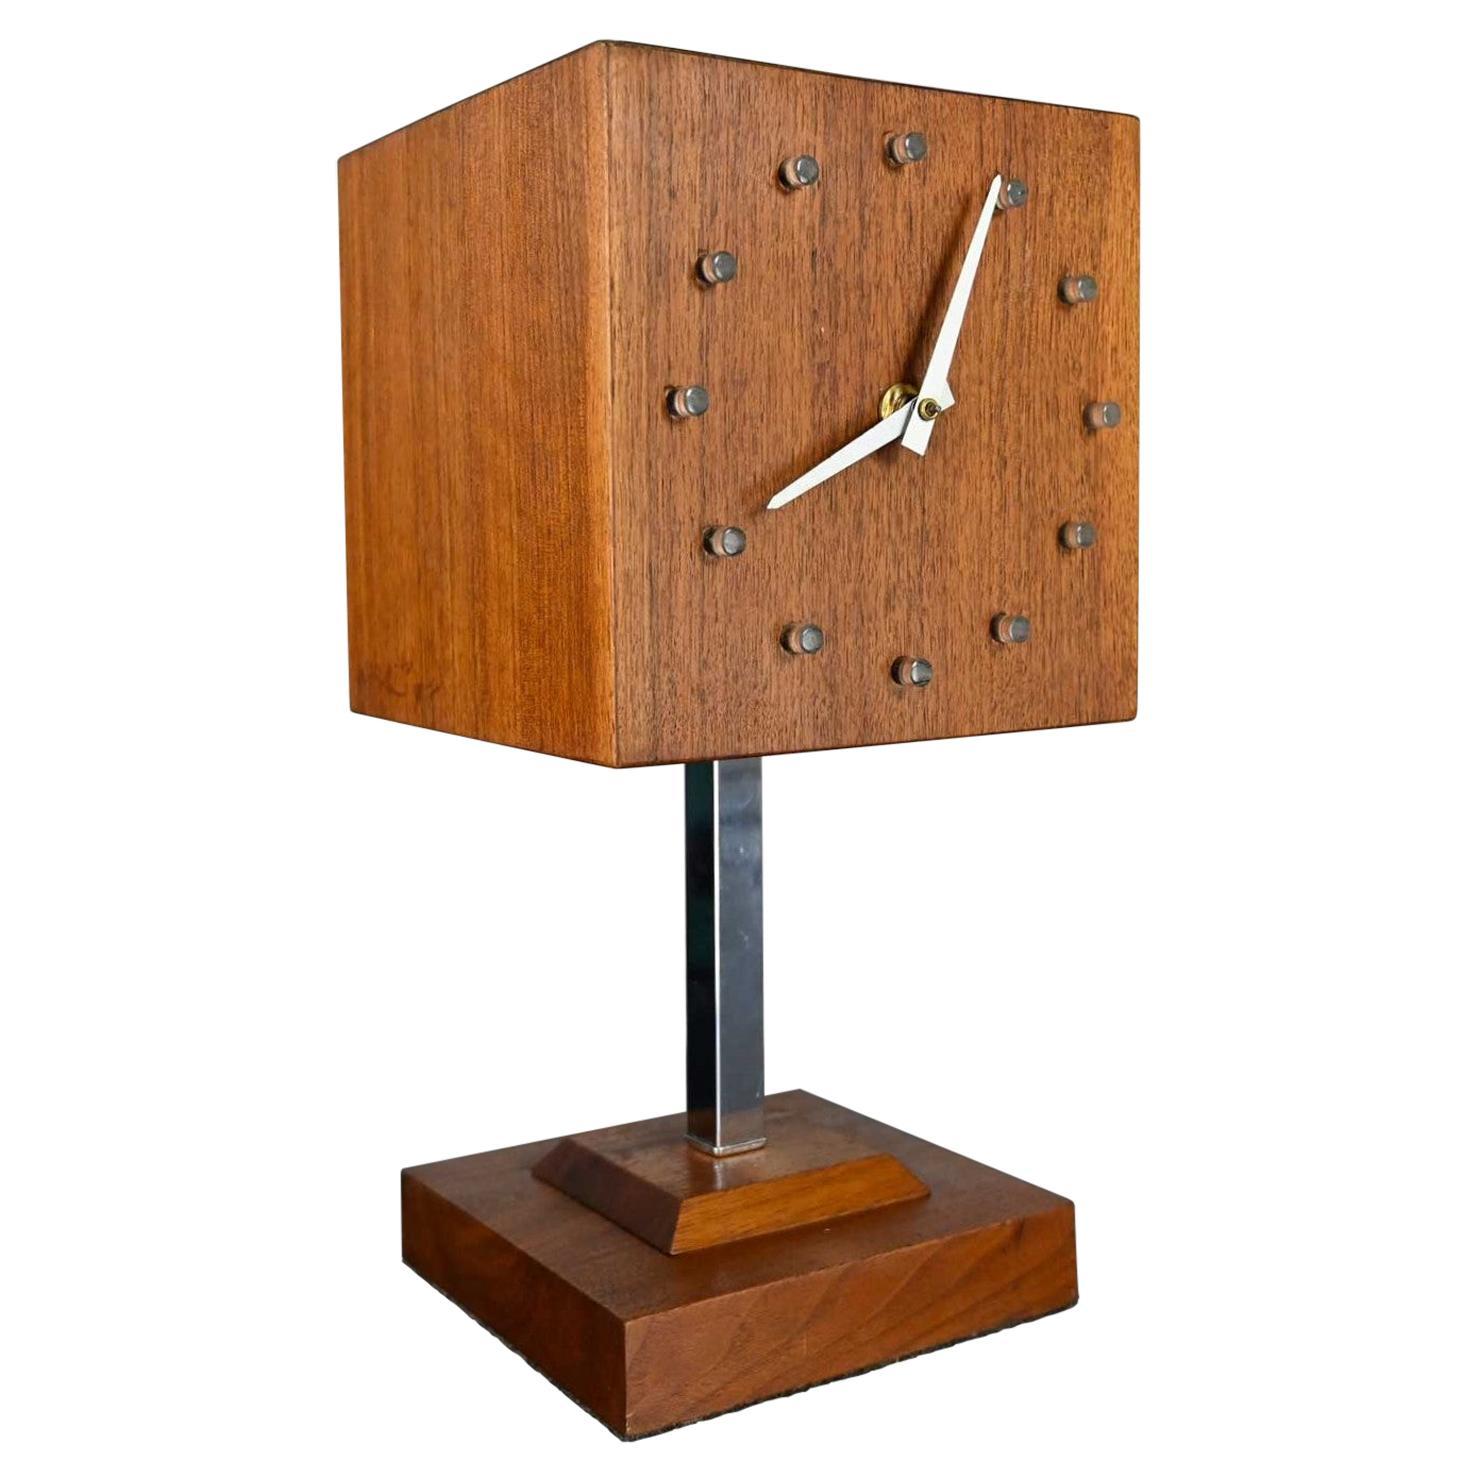 MCM Walnut & Chrome Cube Clock Lamp by V. H. Woolums Style Howard Miller Clocks